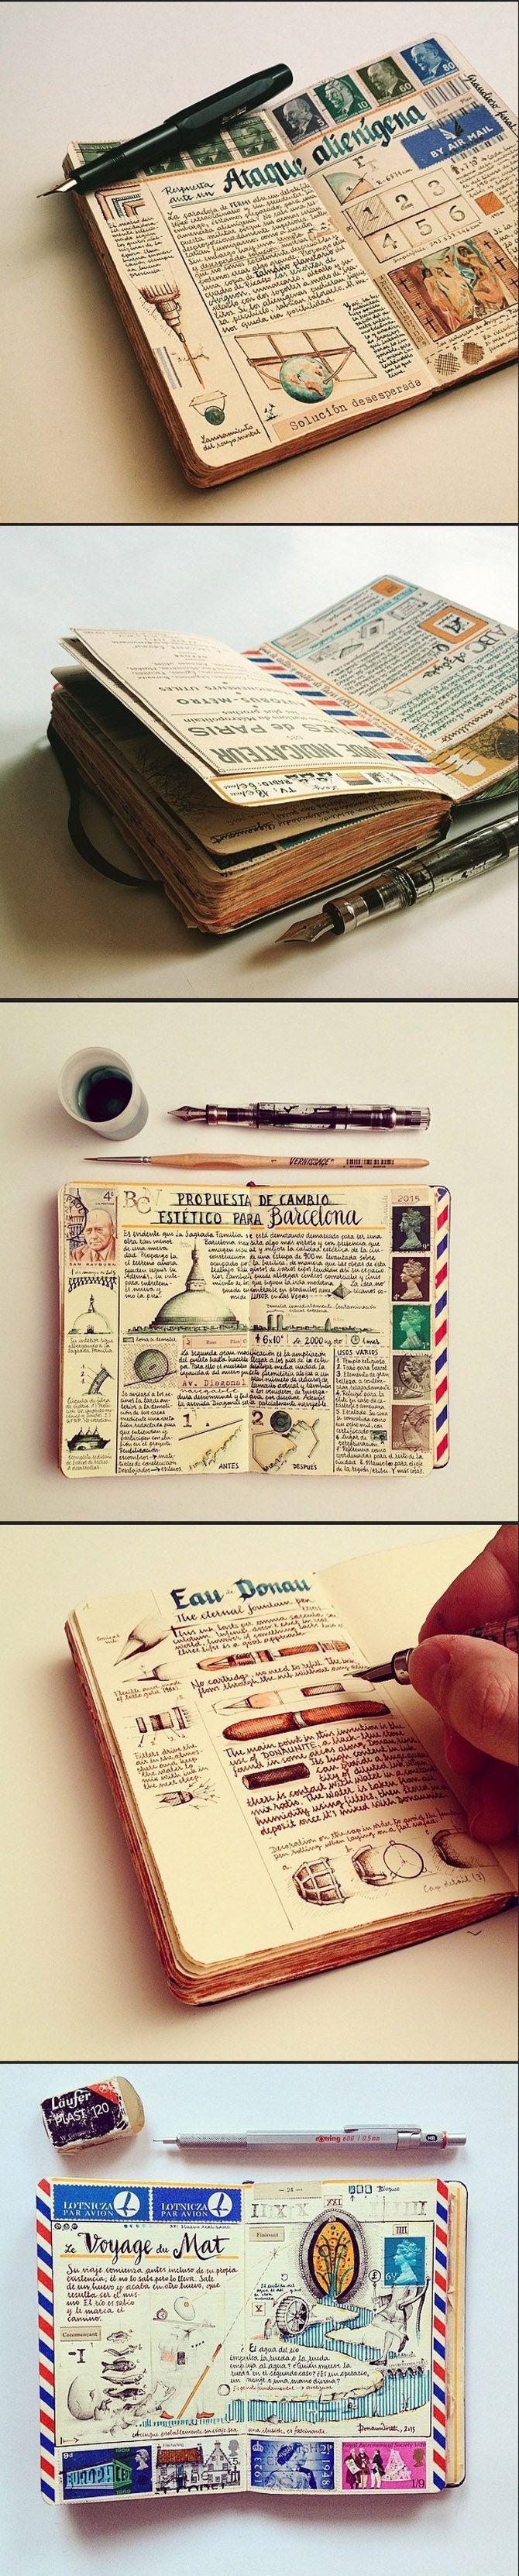 .José Naranja #journal #sketch | https://www.flickr.com/photos/36284439@N00/: